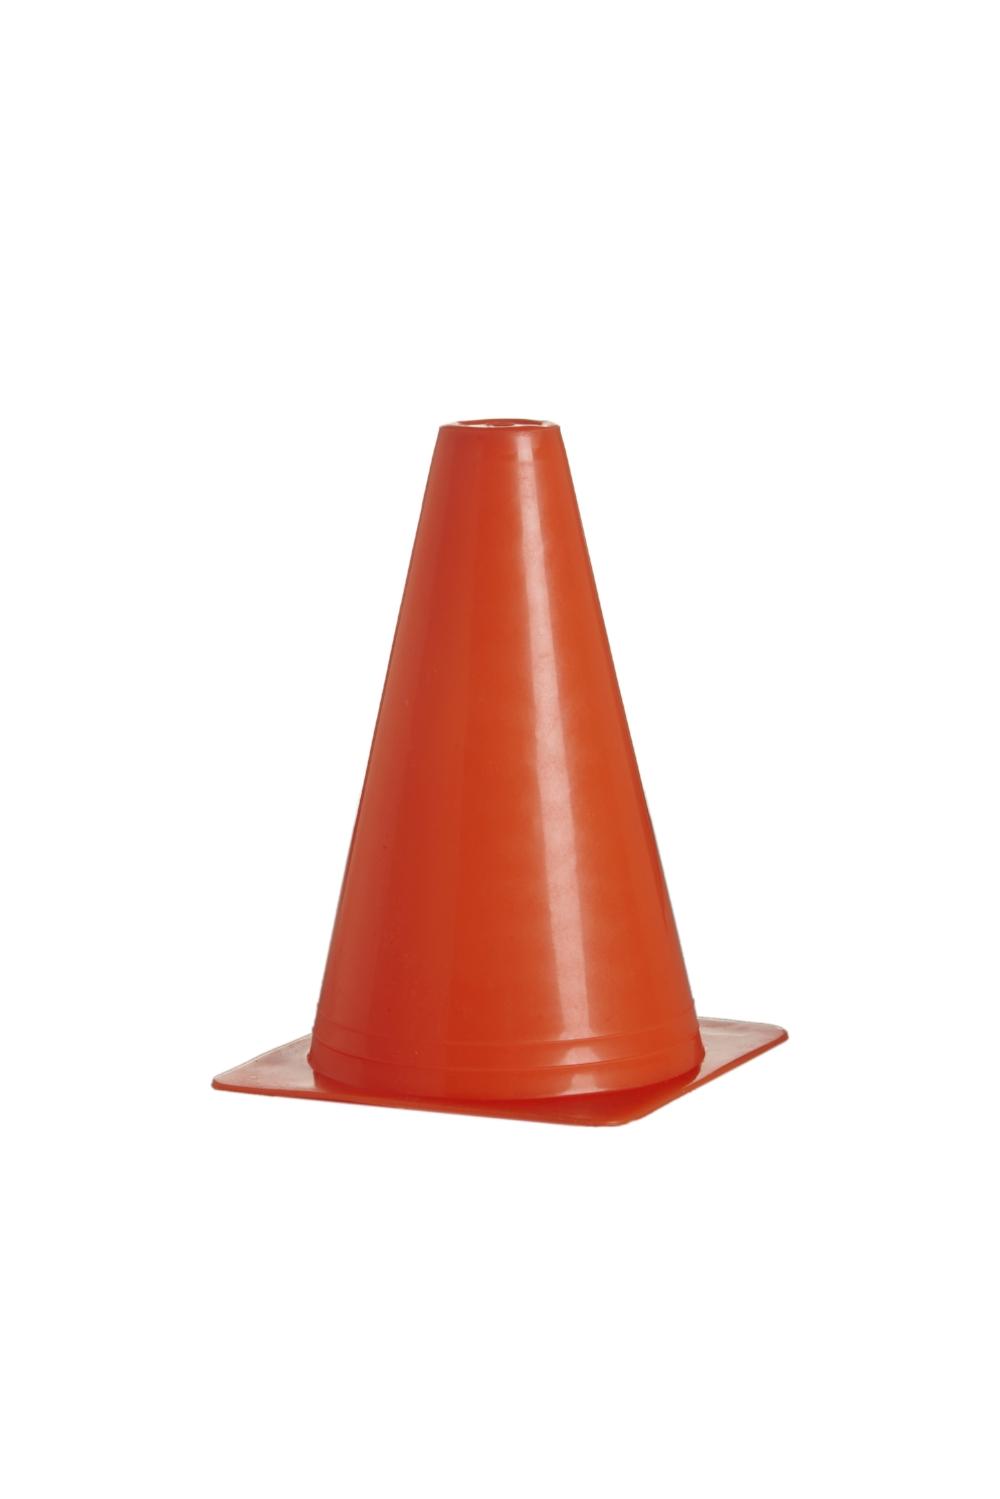 Tall Soccer Cone Orange.jpg